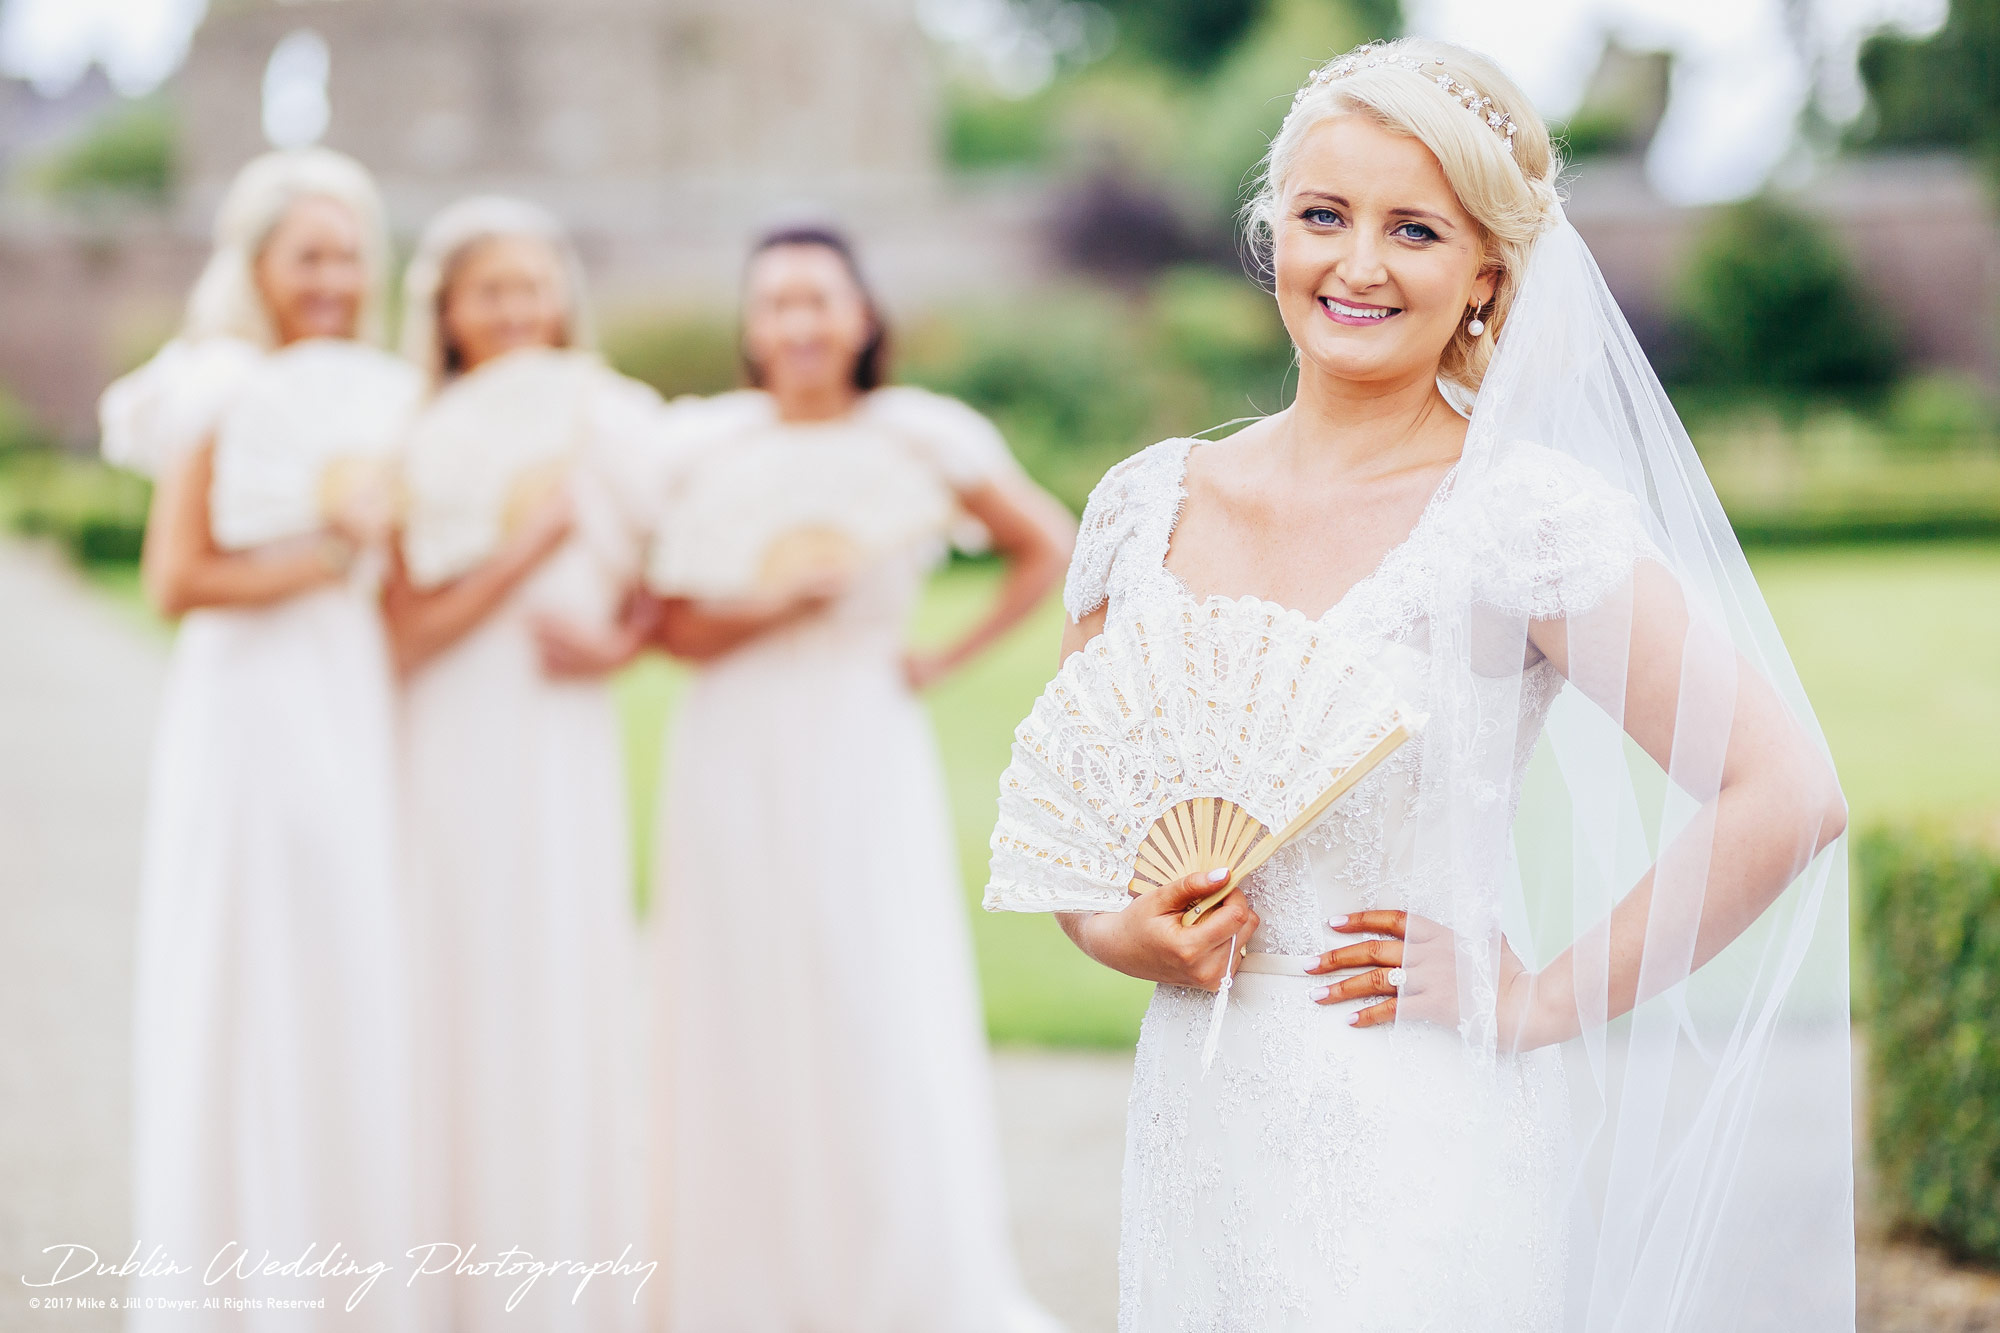 Wedding Photographer Ducketts Grove Bride & Bridesmaids